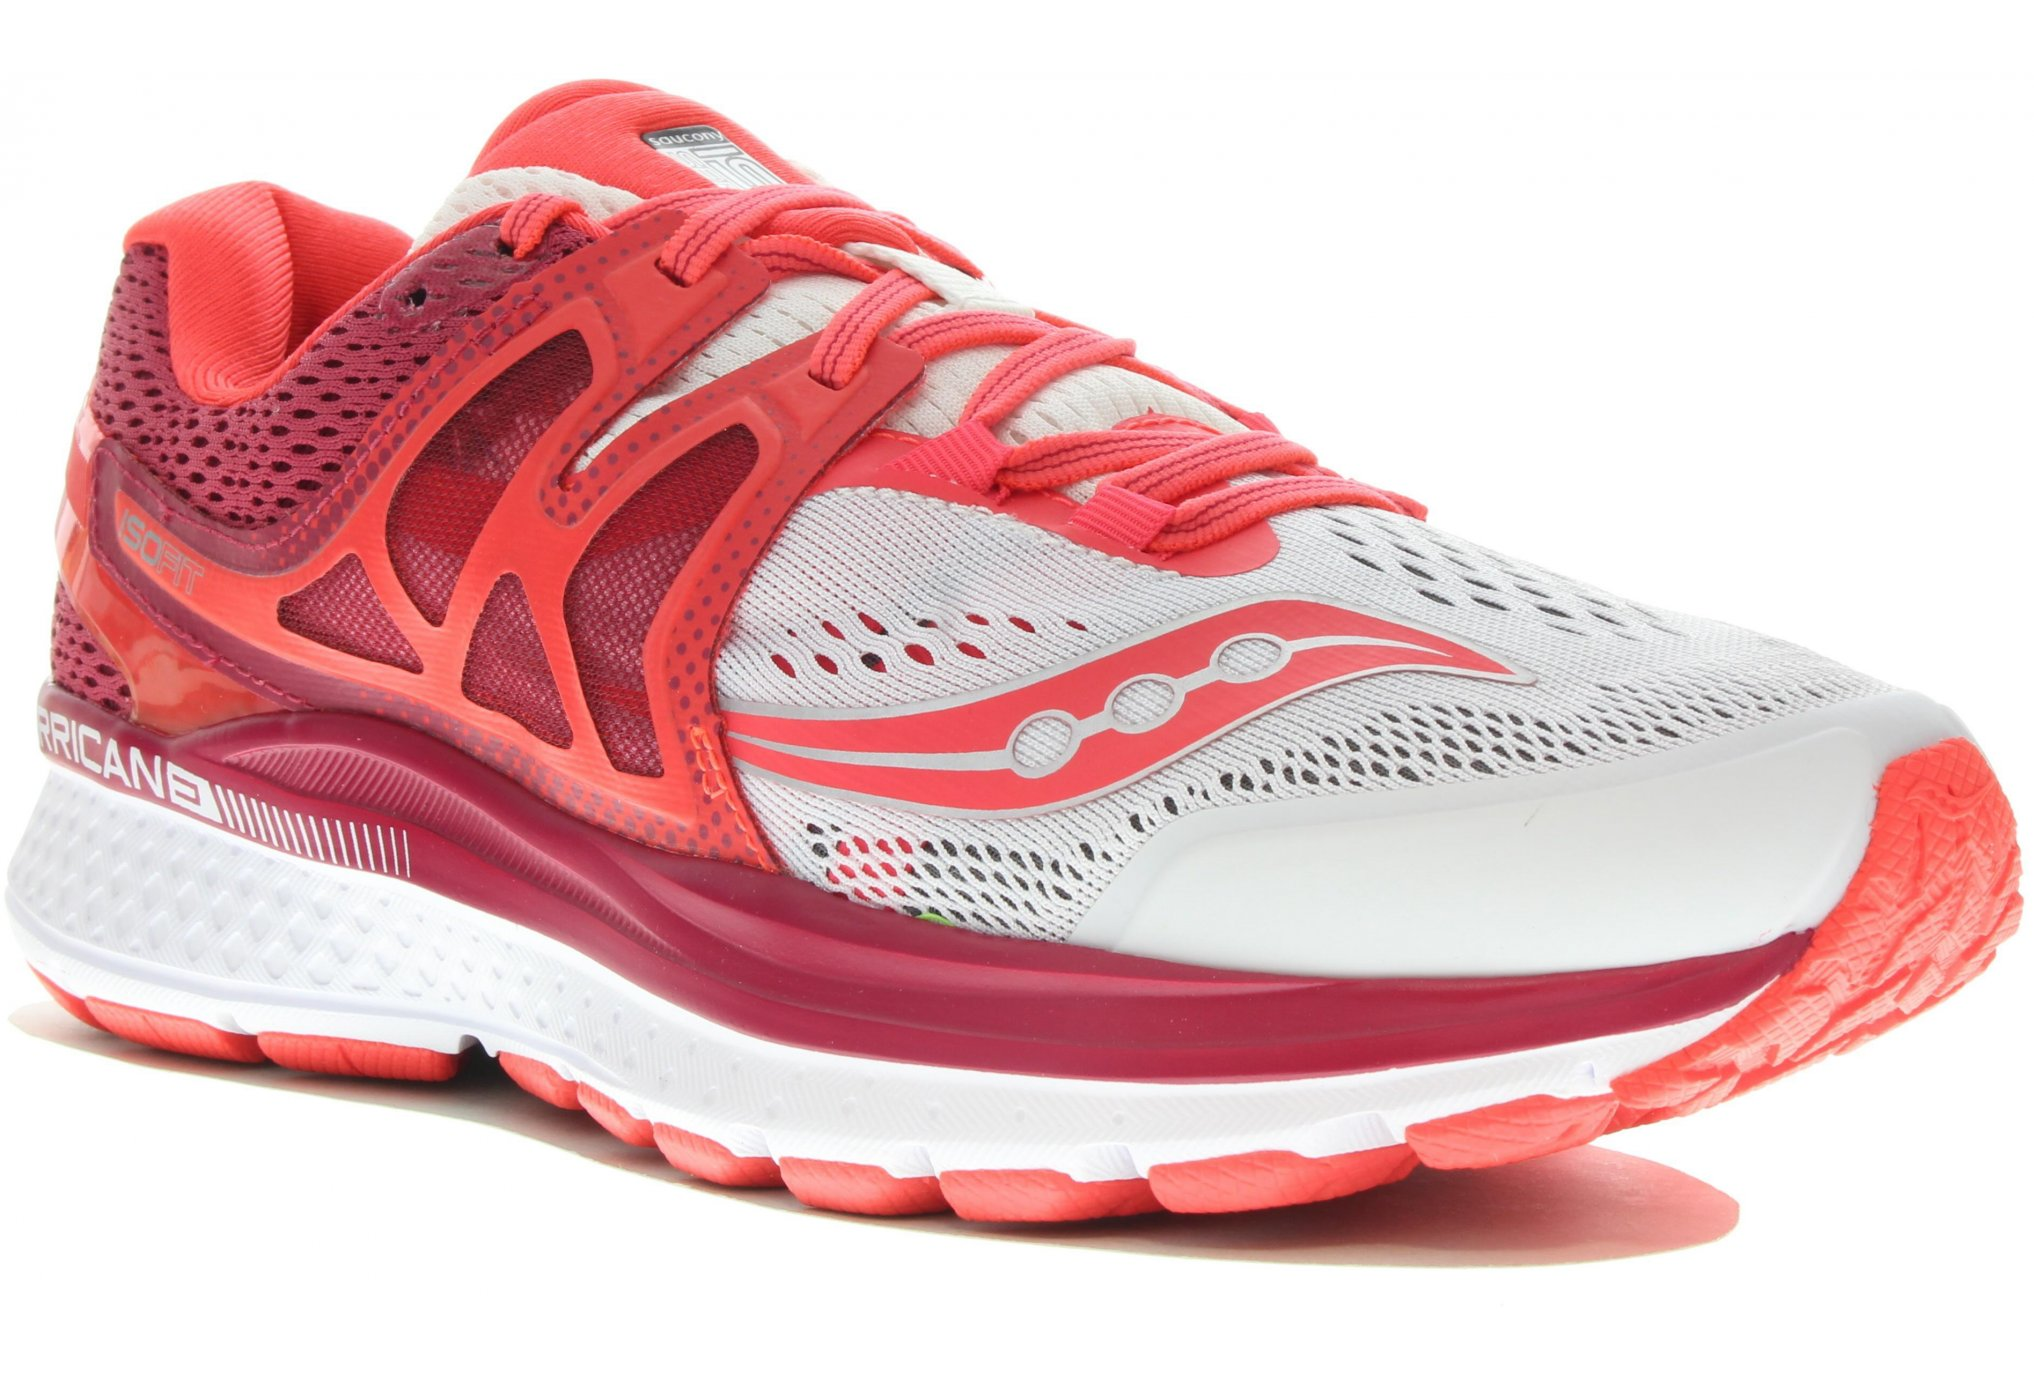 Saucony Hurricane ISO 3 W Chaussures running femme